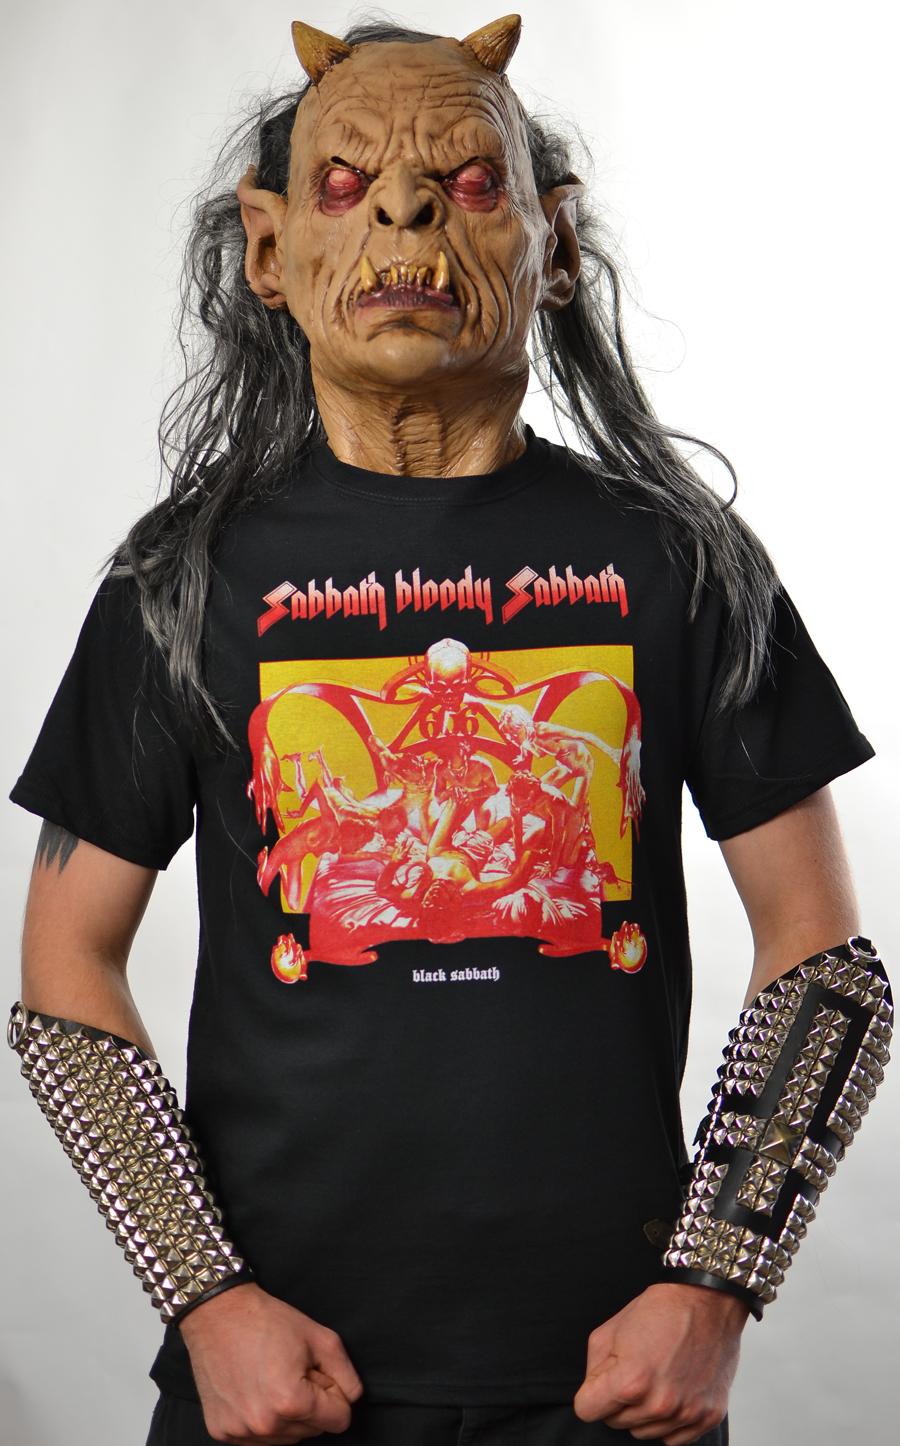 Sabbath Bloody Sabbath T-Shirt Black Sabbath